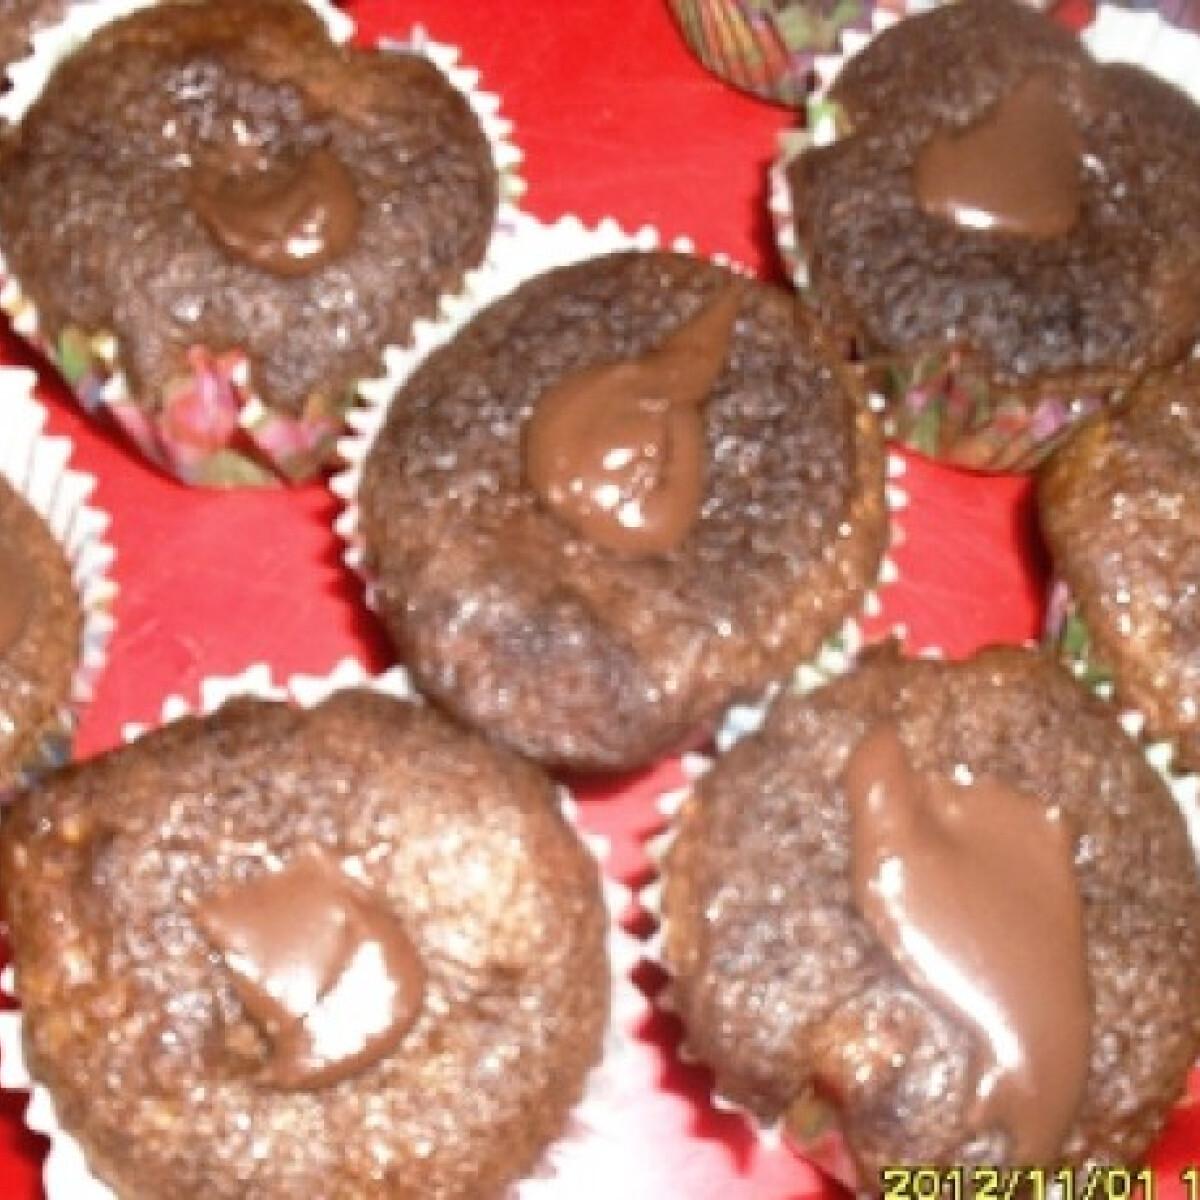 Zabpelyhes-puncsos-kakaós muffin